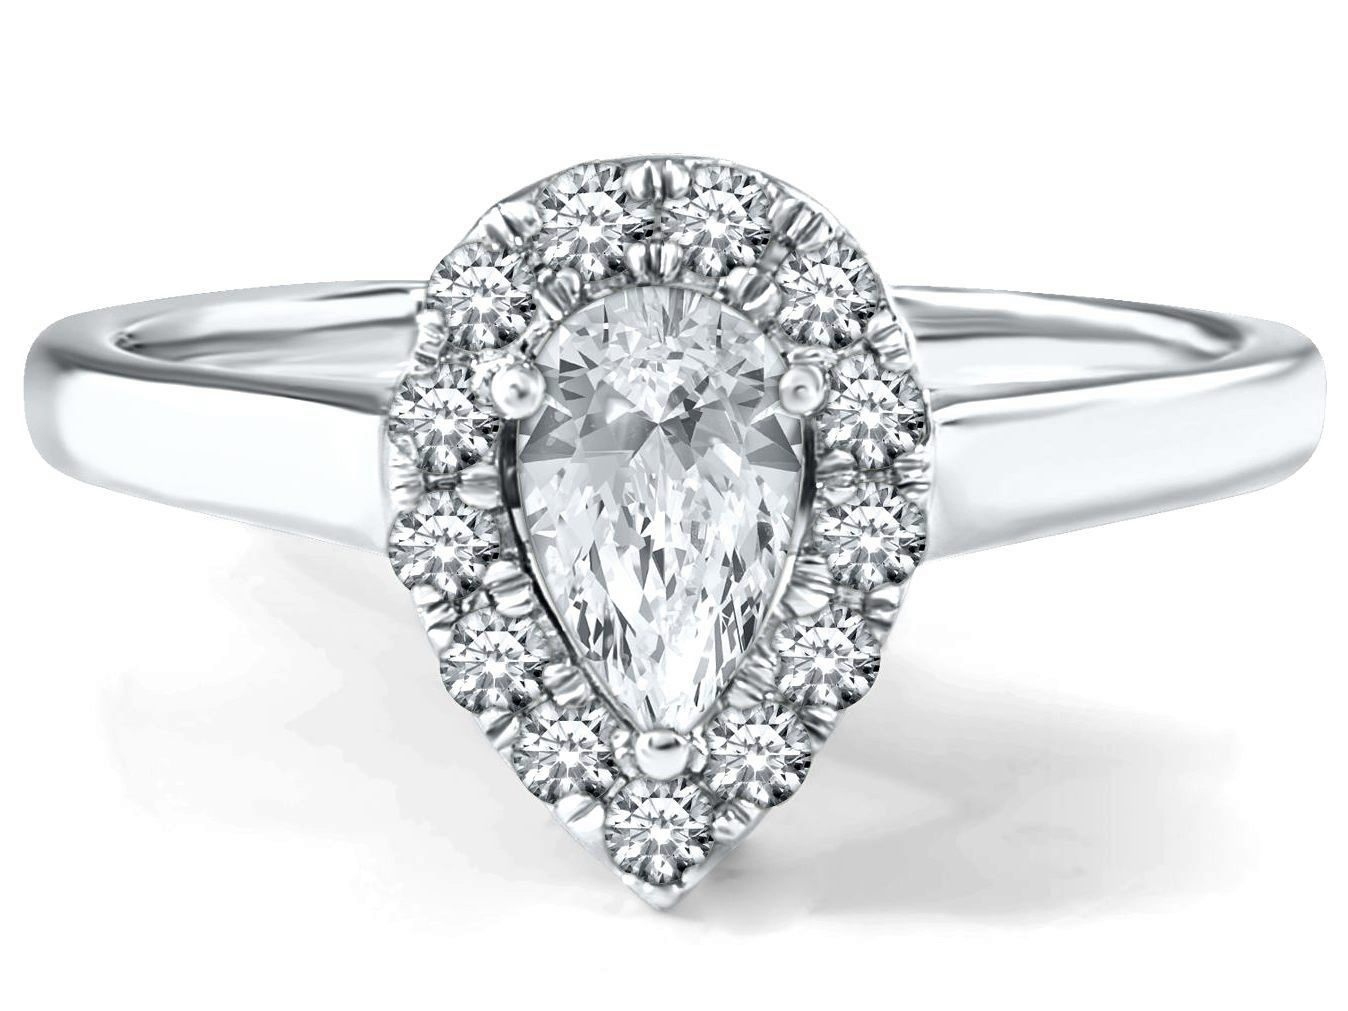 Engagement Ring Pear Shape Diamond Petite Halo Engagement Ring in 14K White